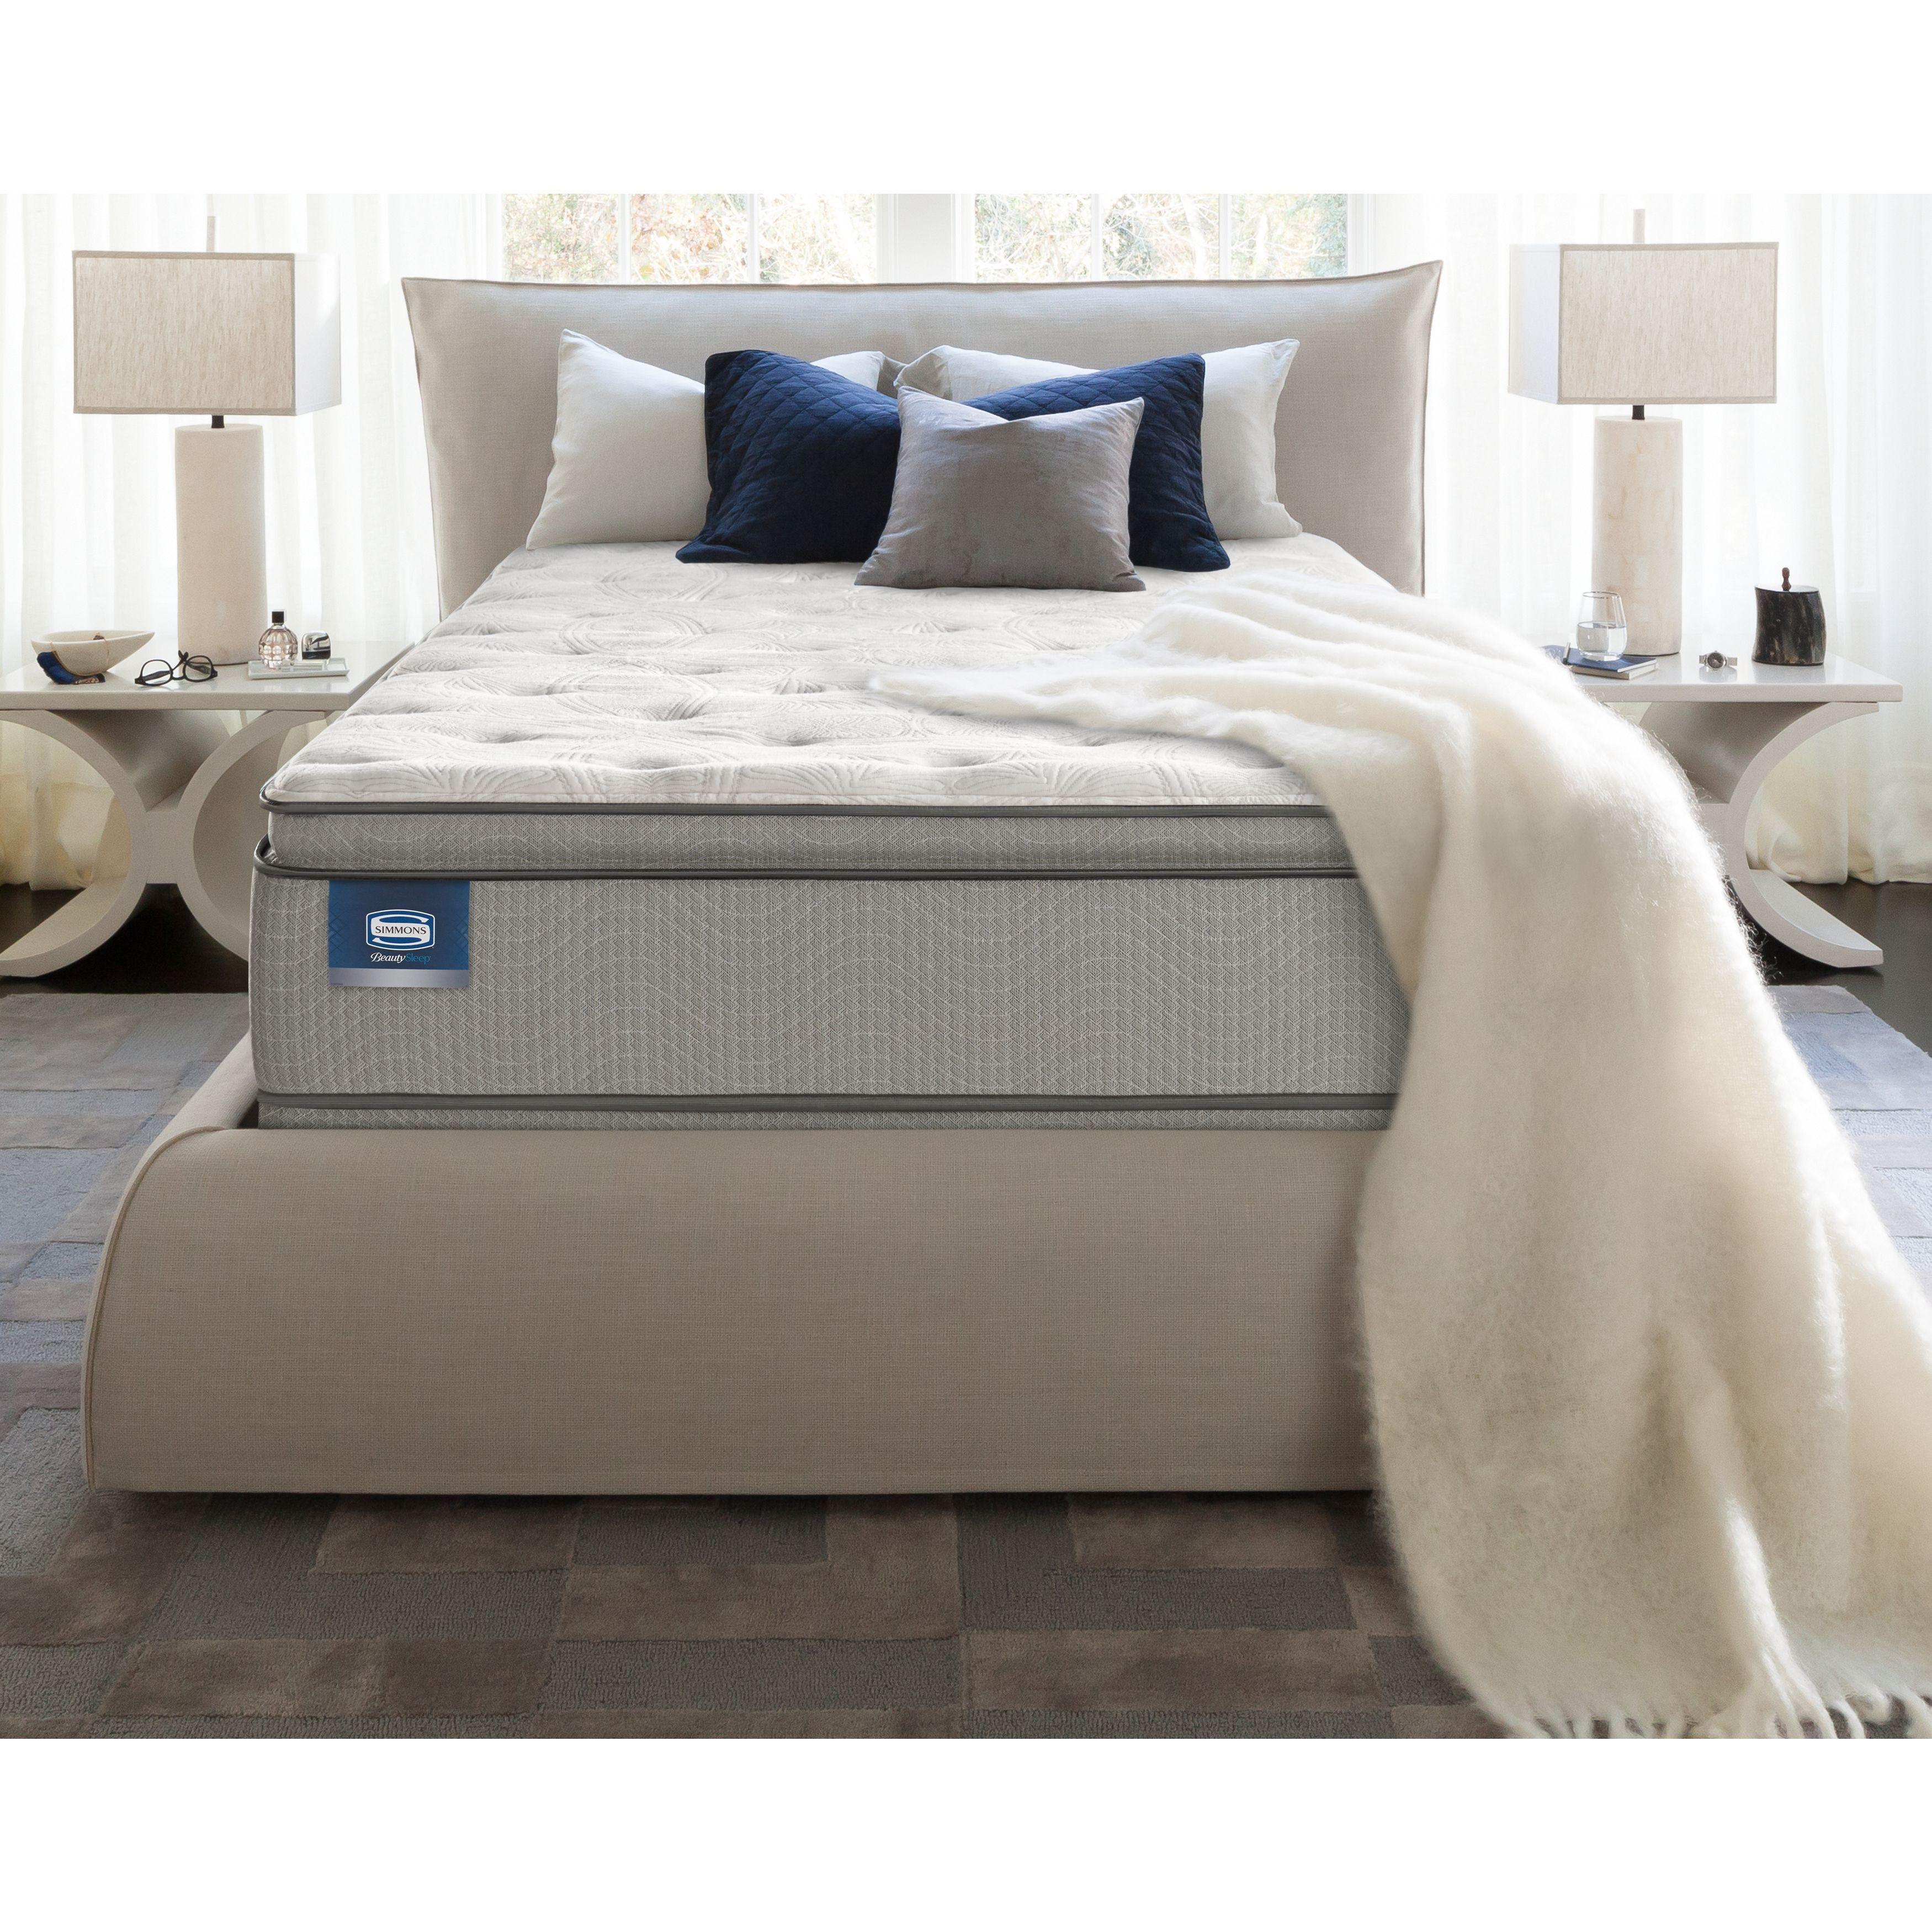 comforter template info king dye cover duvet set comforters compassion california tie full